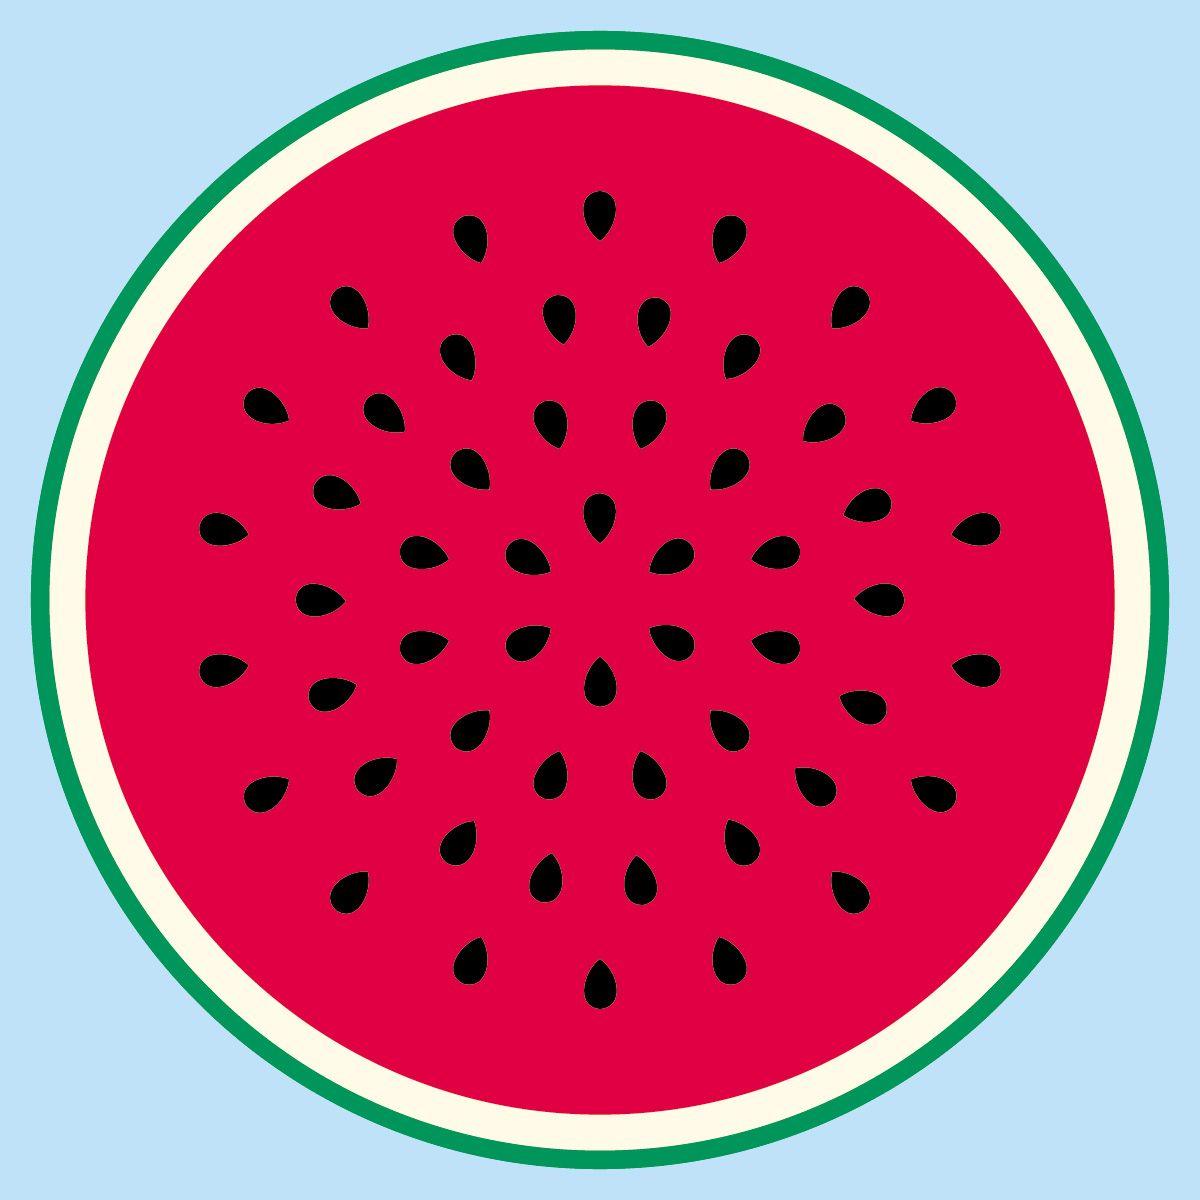 Watermelon clipart circle. Illust google wathermelon